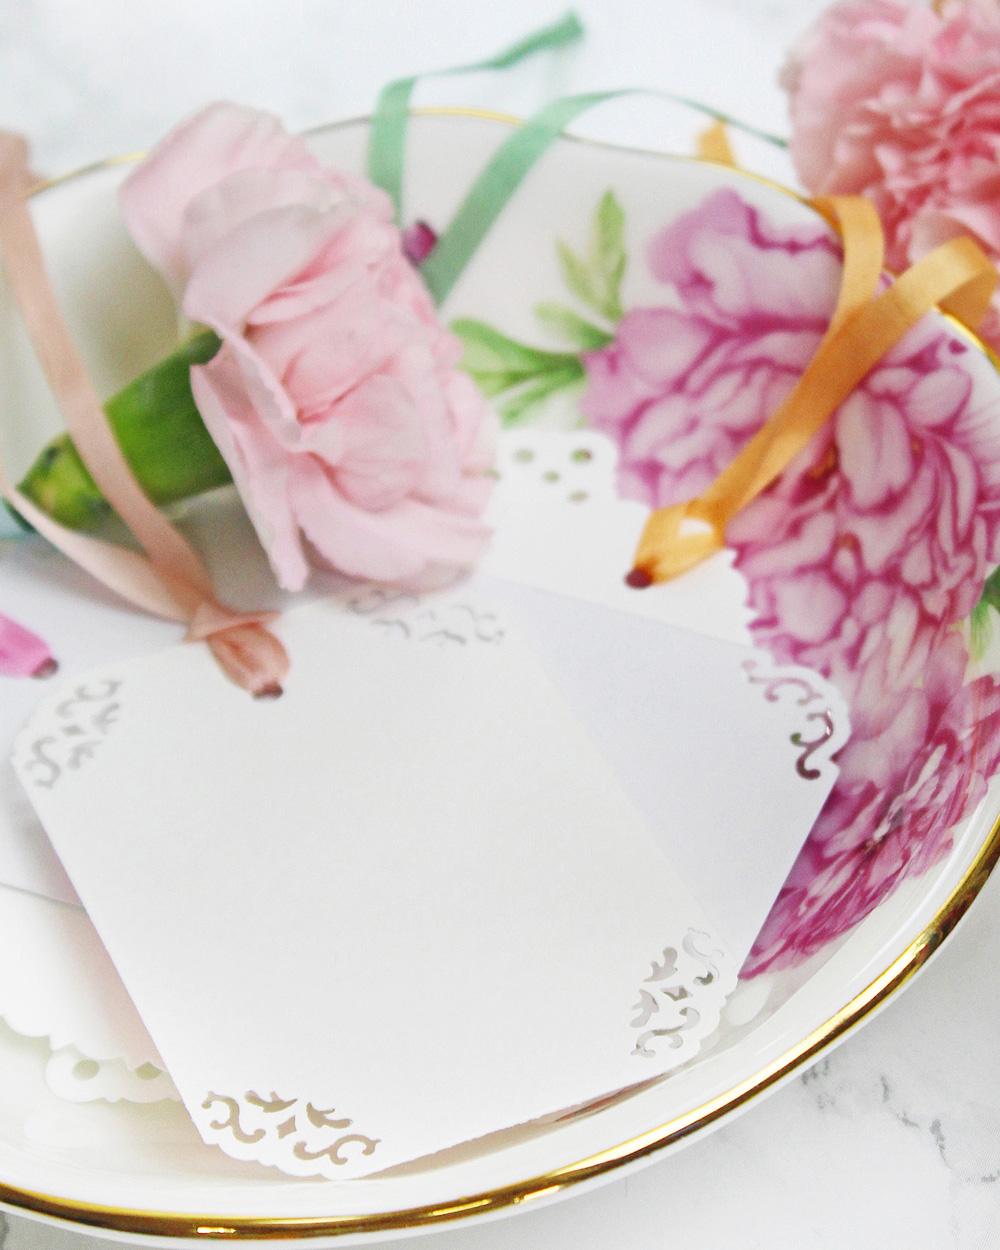 diy-spring-wedding-guest-book-11-0416.jpg